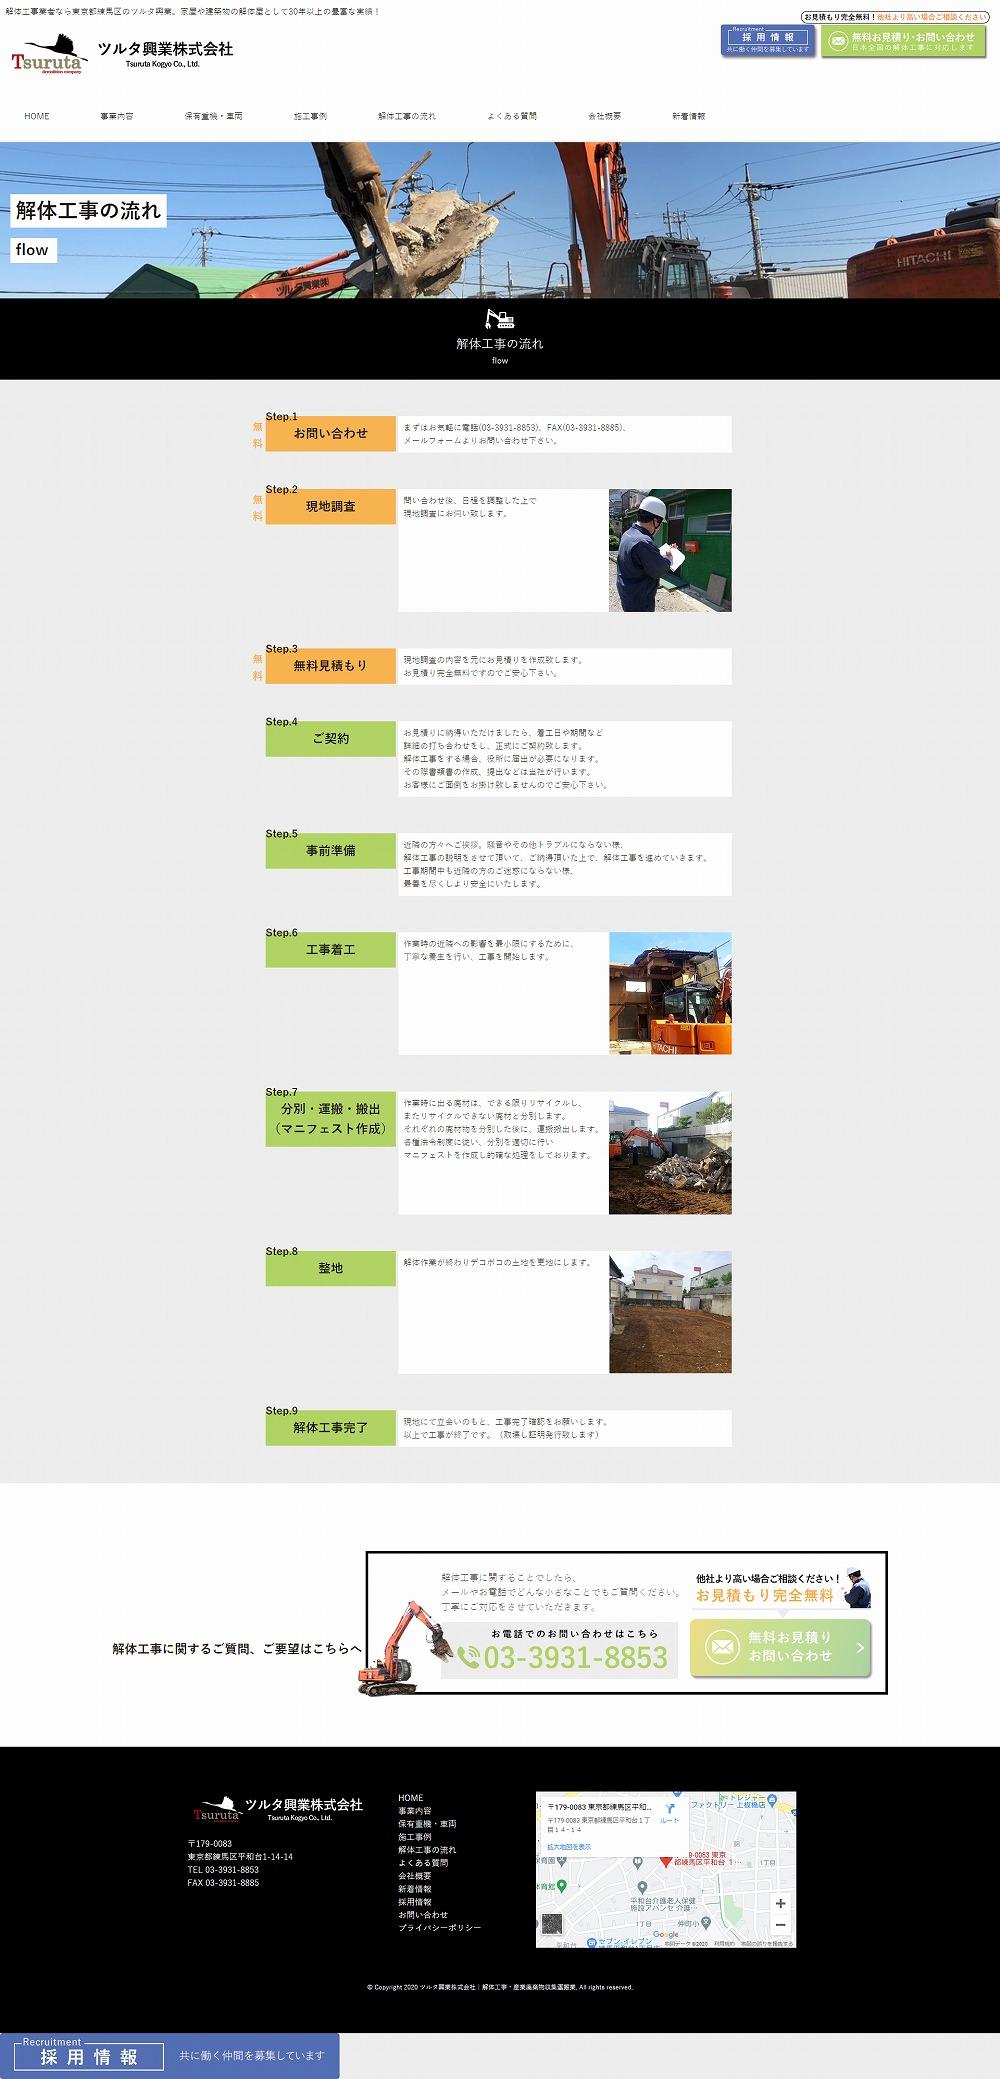 FireShot Capture 190 - 解体工事の流れ - tsuruta-kaitai.info